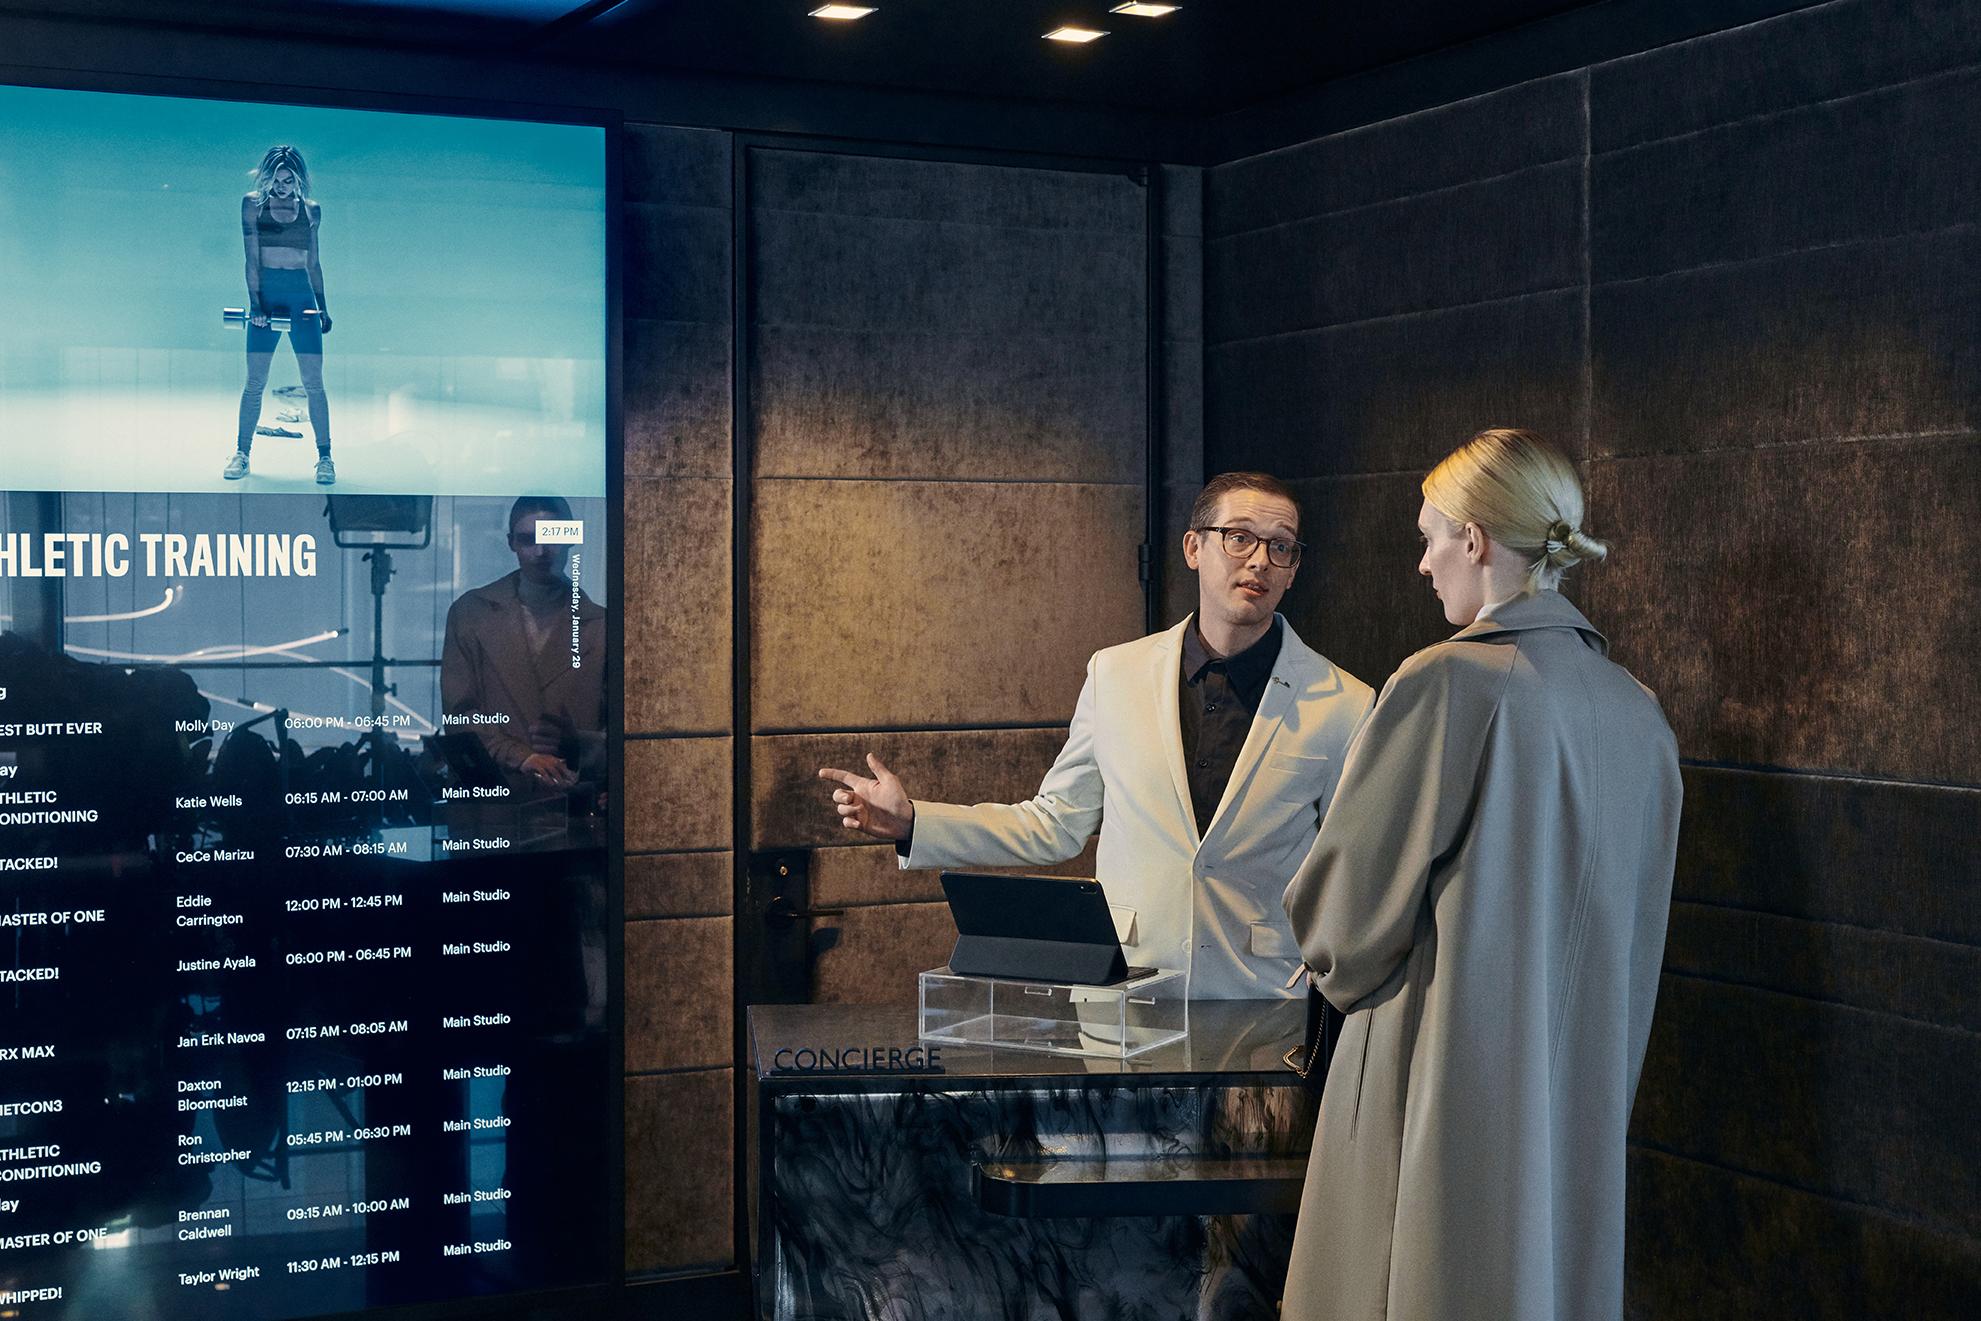 Concierge at Equinox Hotel New York